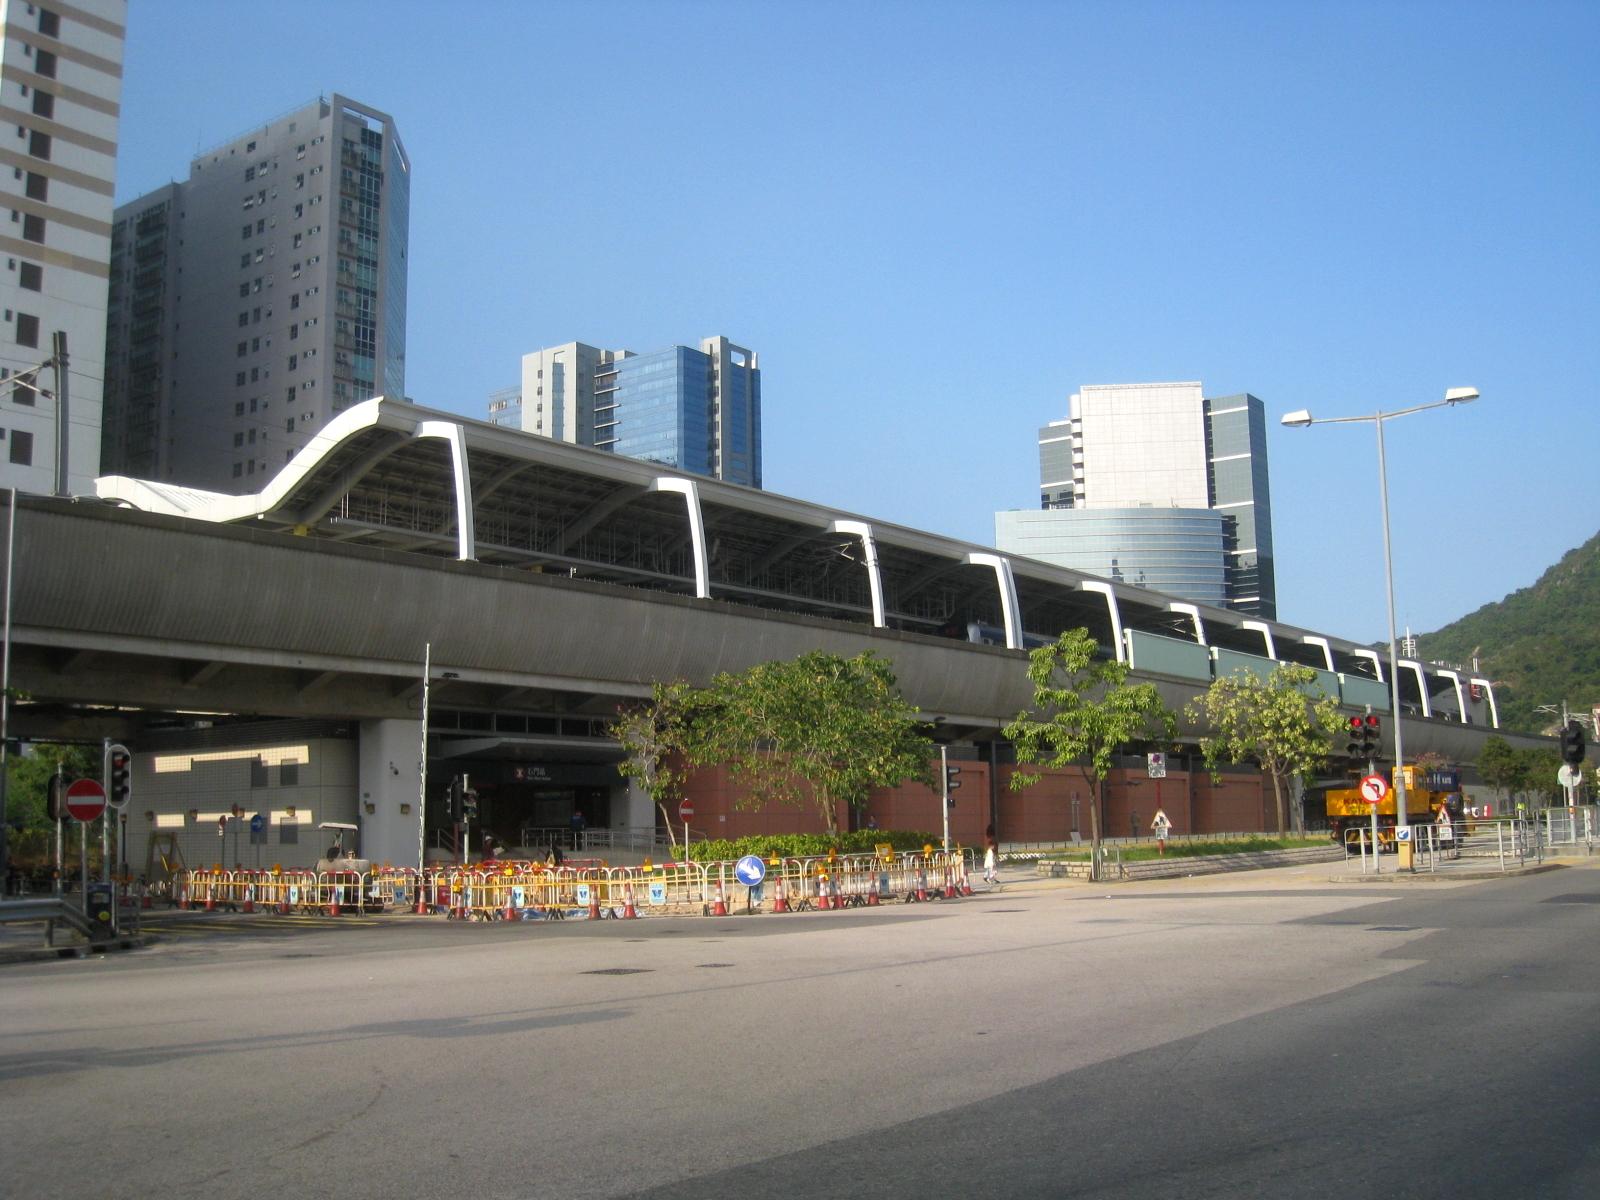 Station Island School